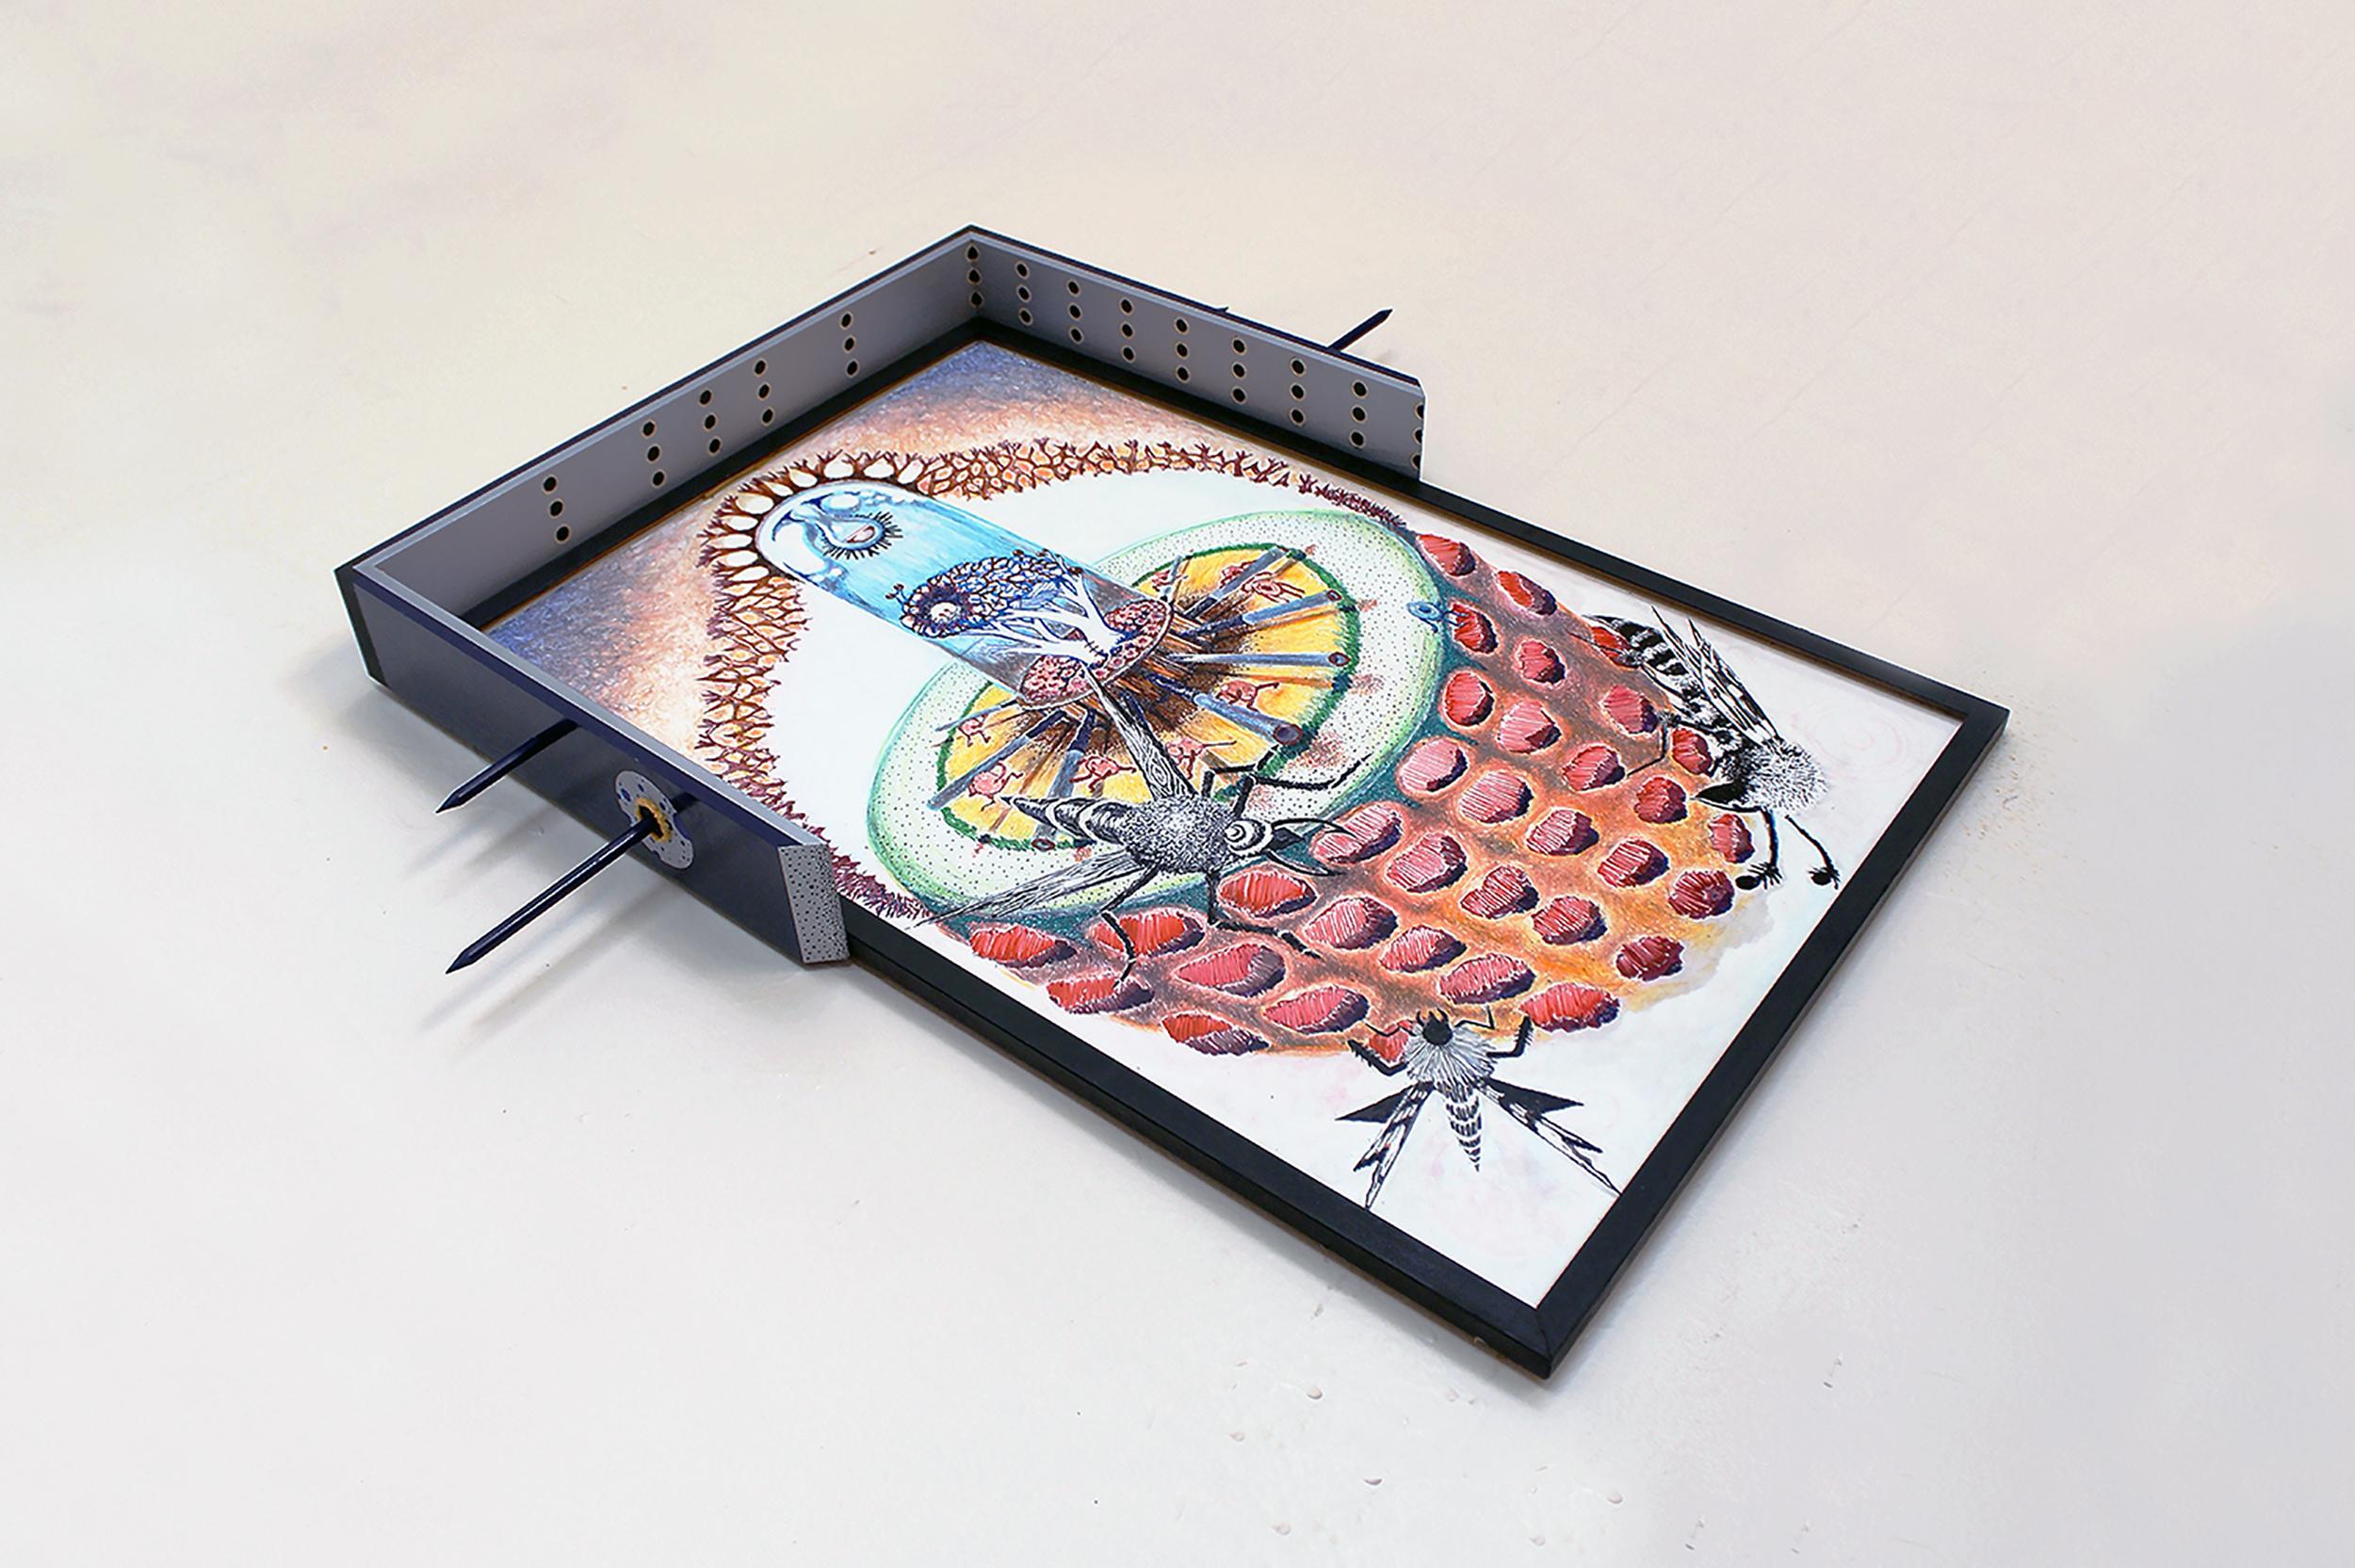 paperwaspdetail.jpg